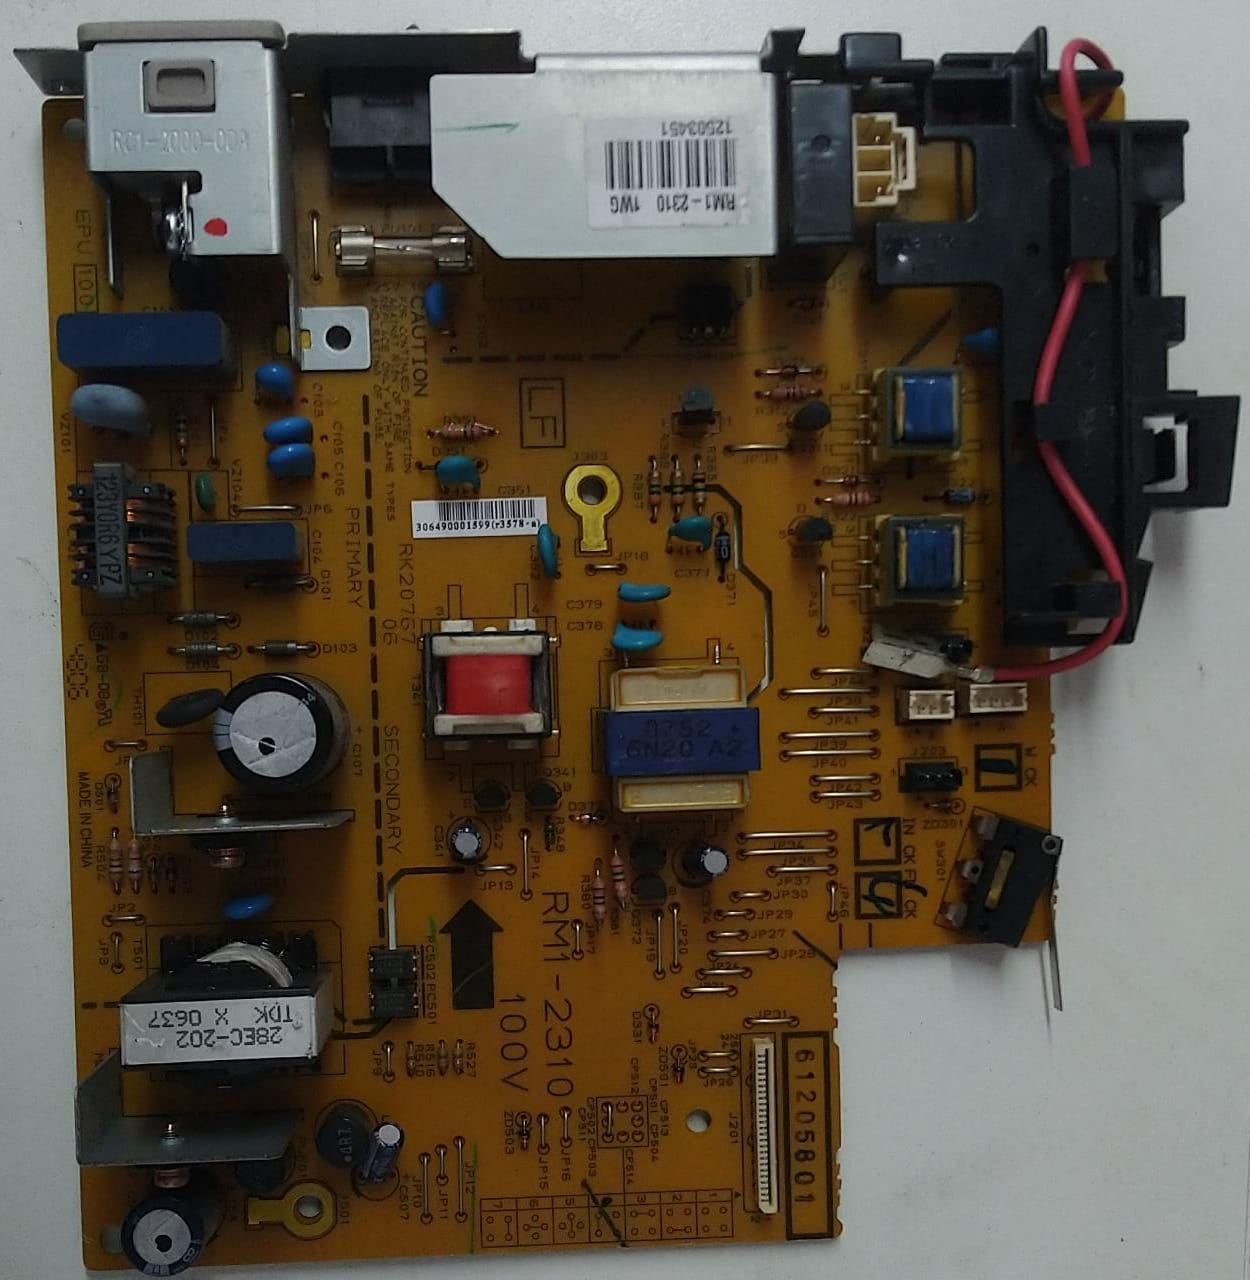 Placa Fonte HP Laserjet 1018 1022 Rm1-2315 / 2310